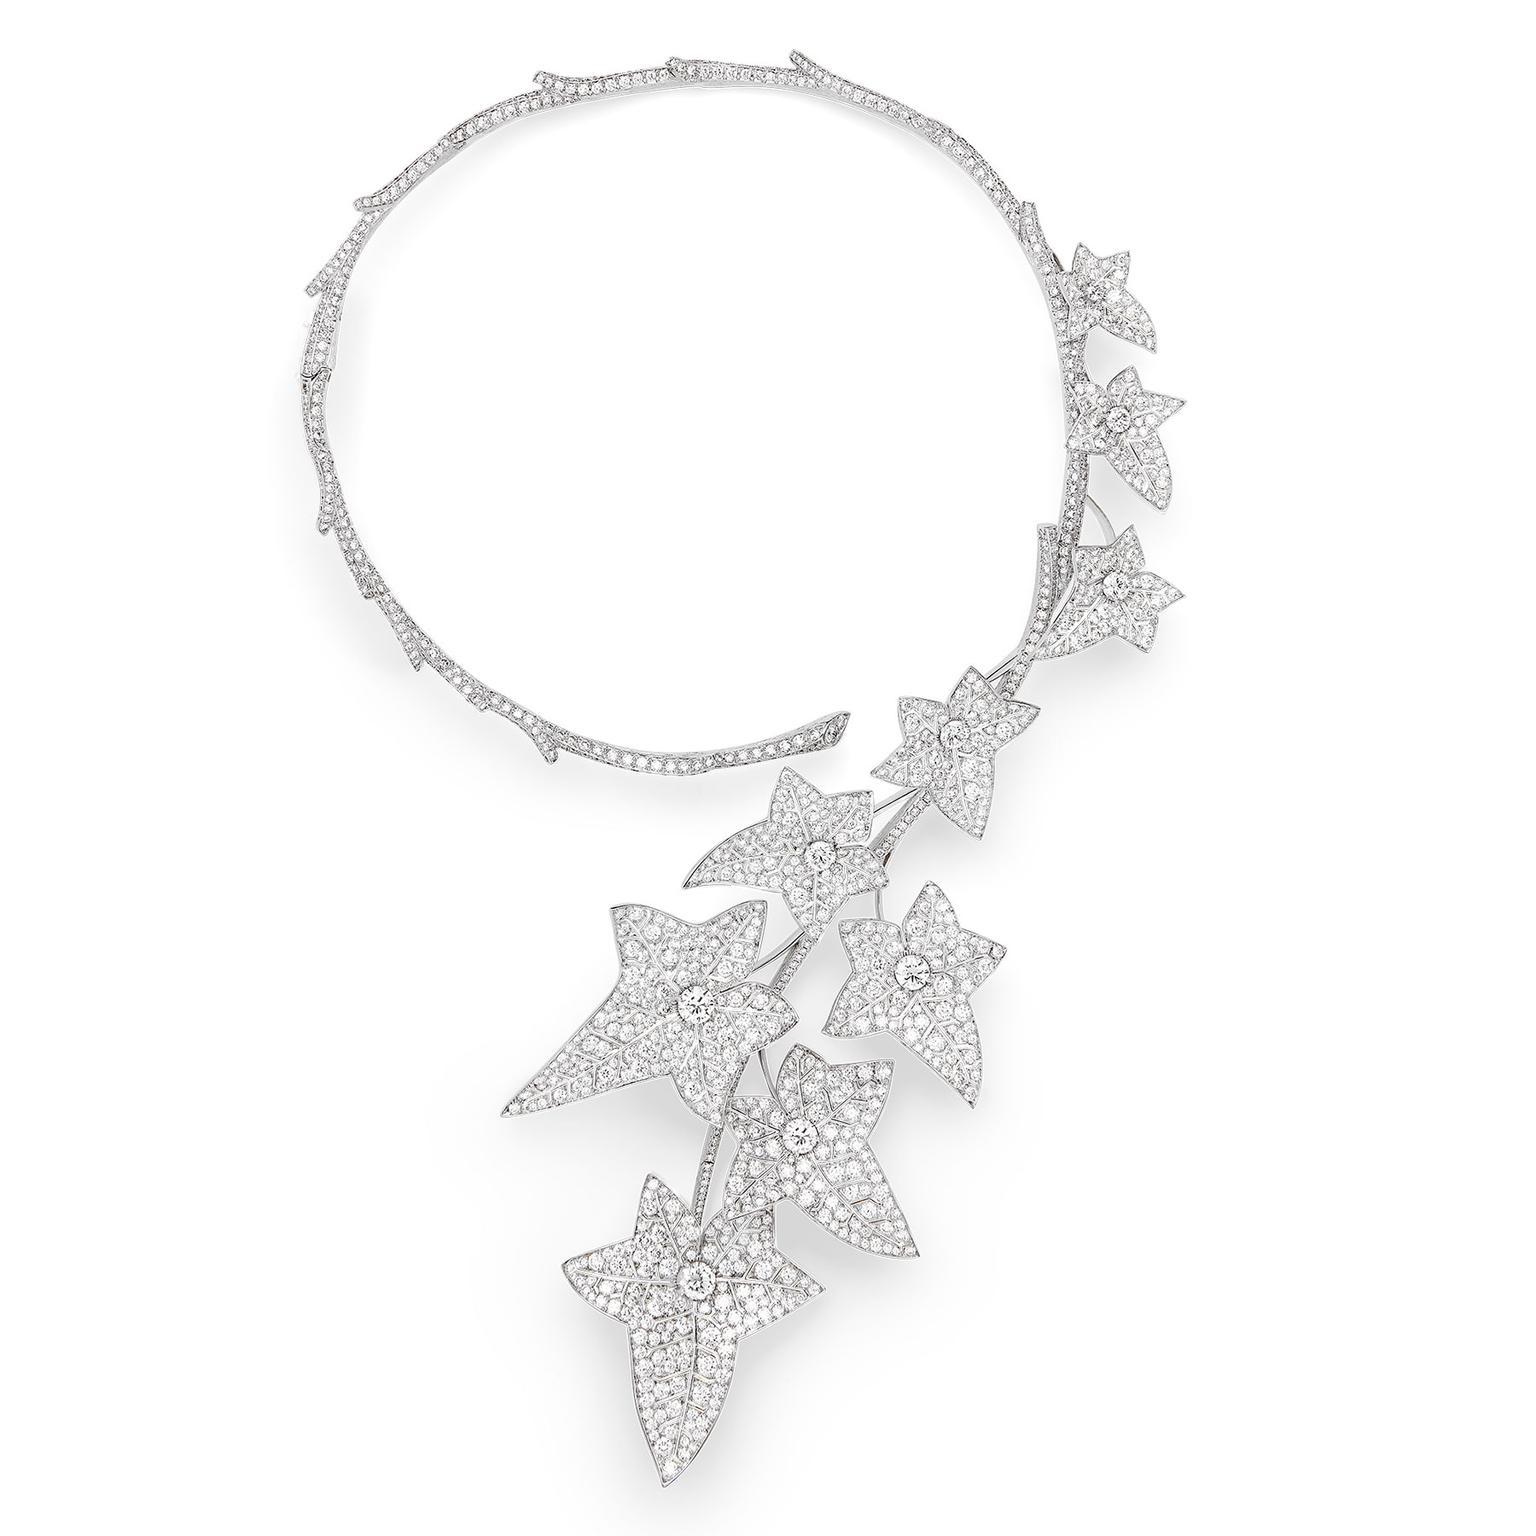 Luxury diamond question mark necklace best jewelry nature triomphante lierre de paris high jewellery question mark aloadofball Image collections